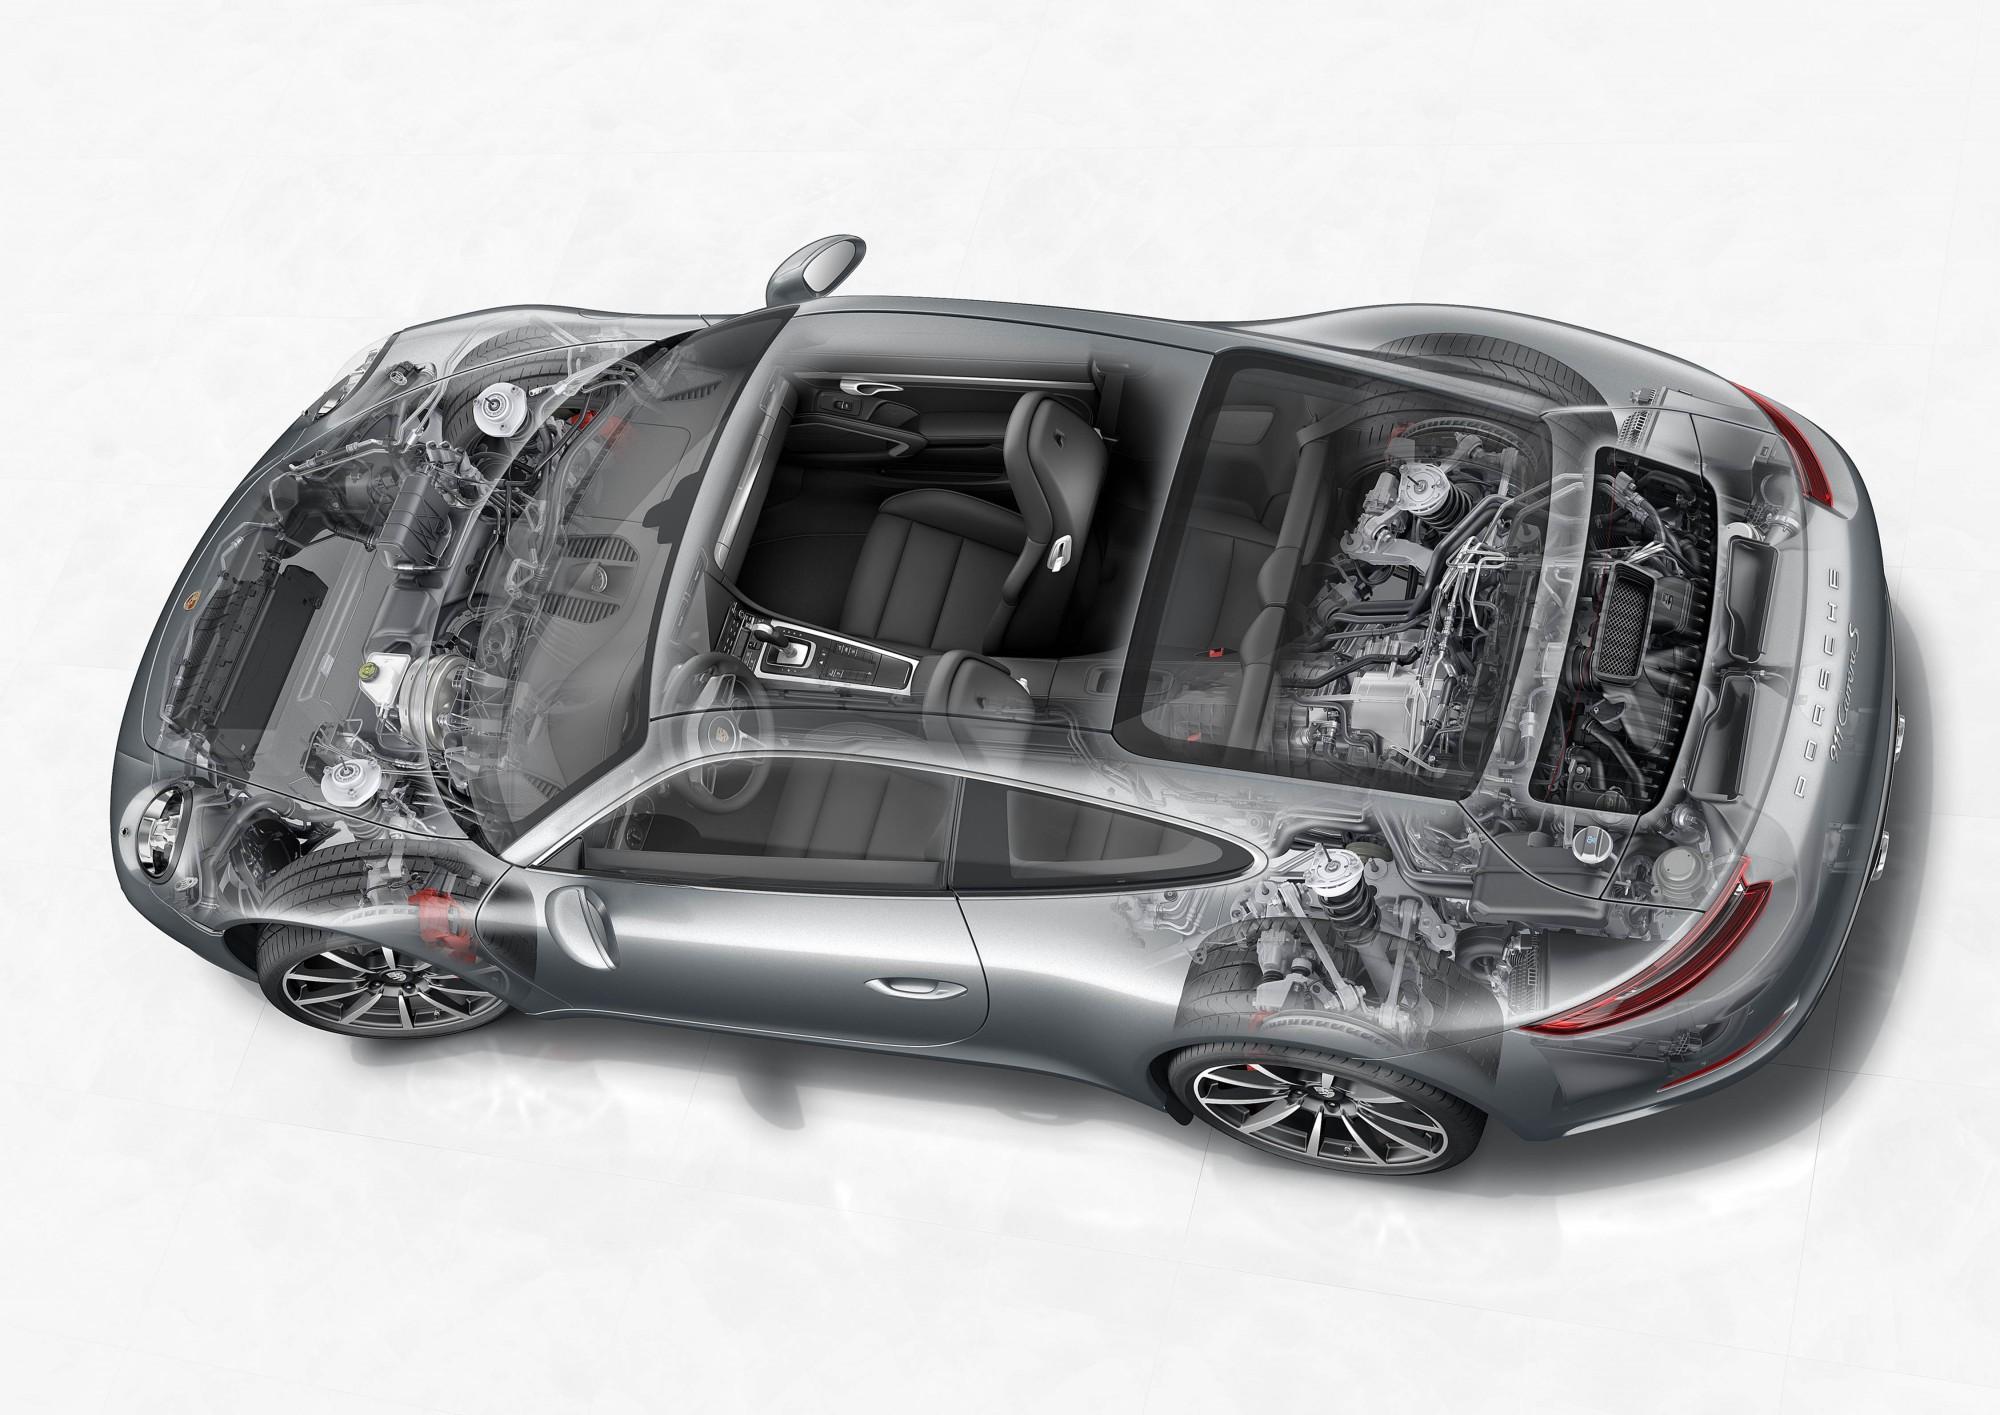 08-Porsche-911-Carrera